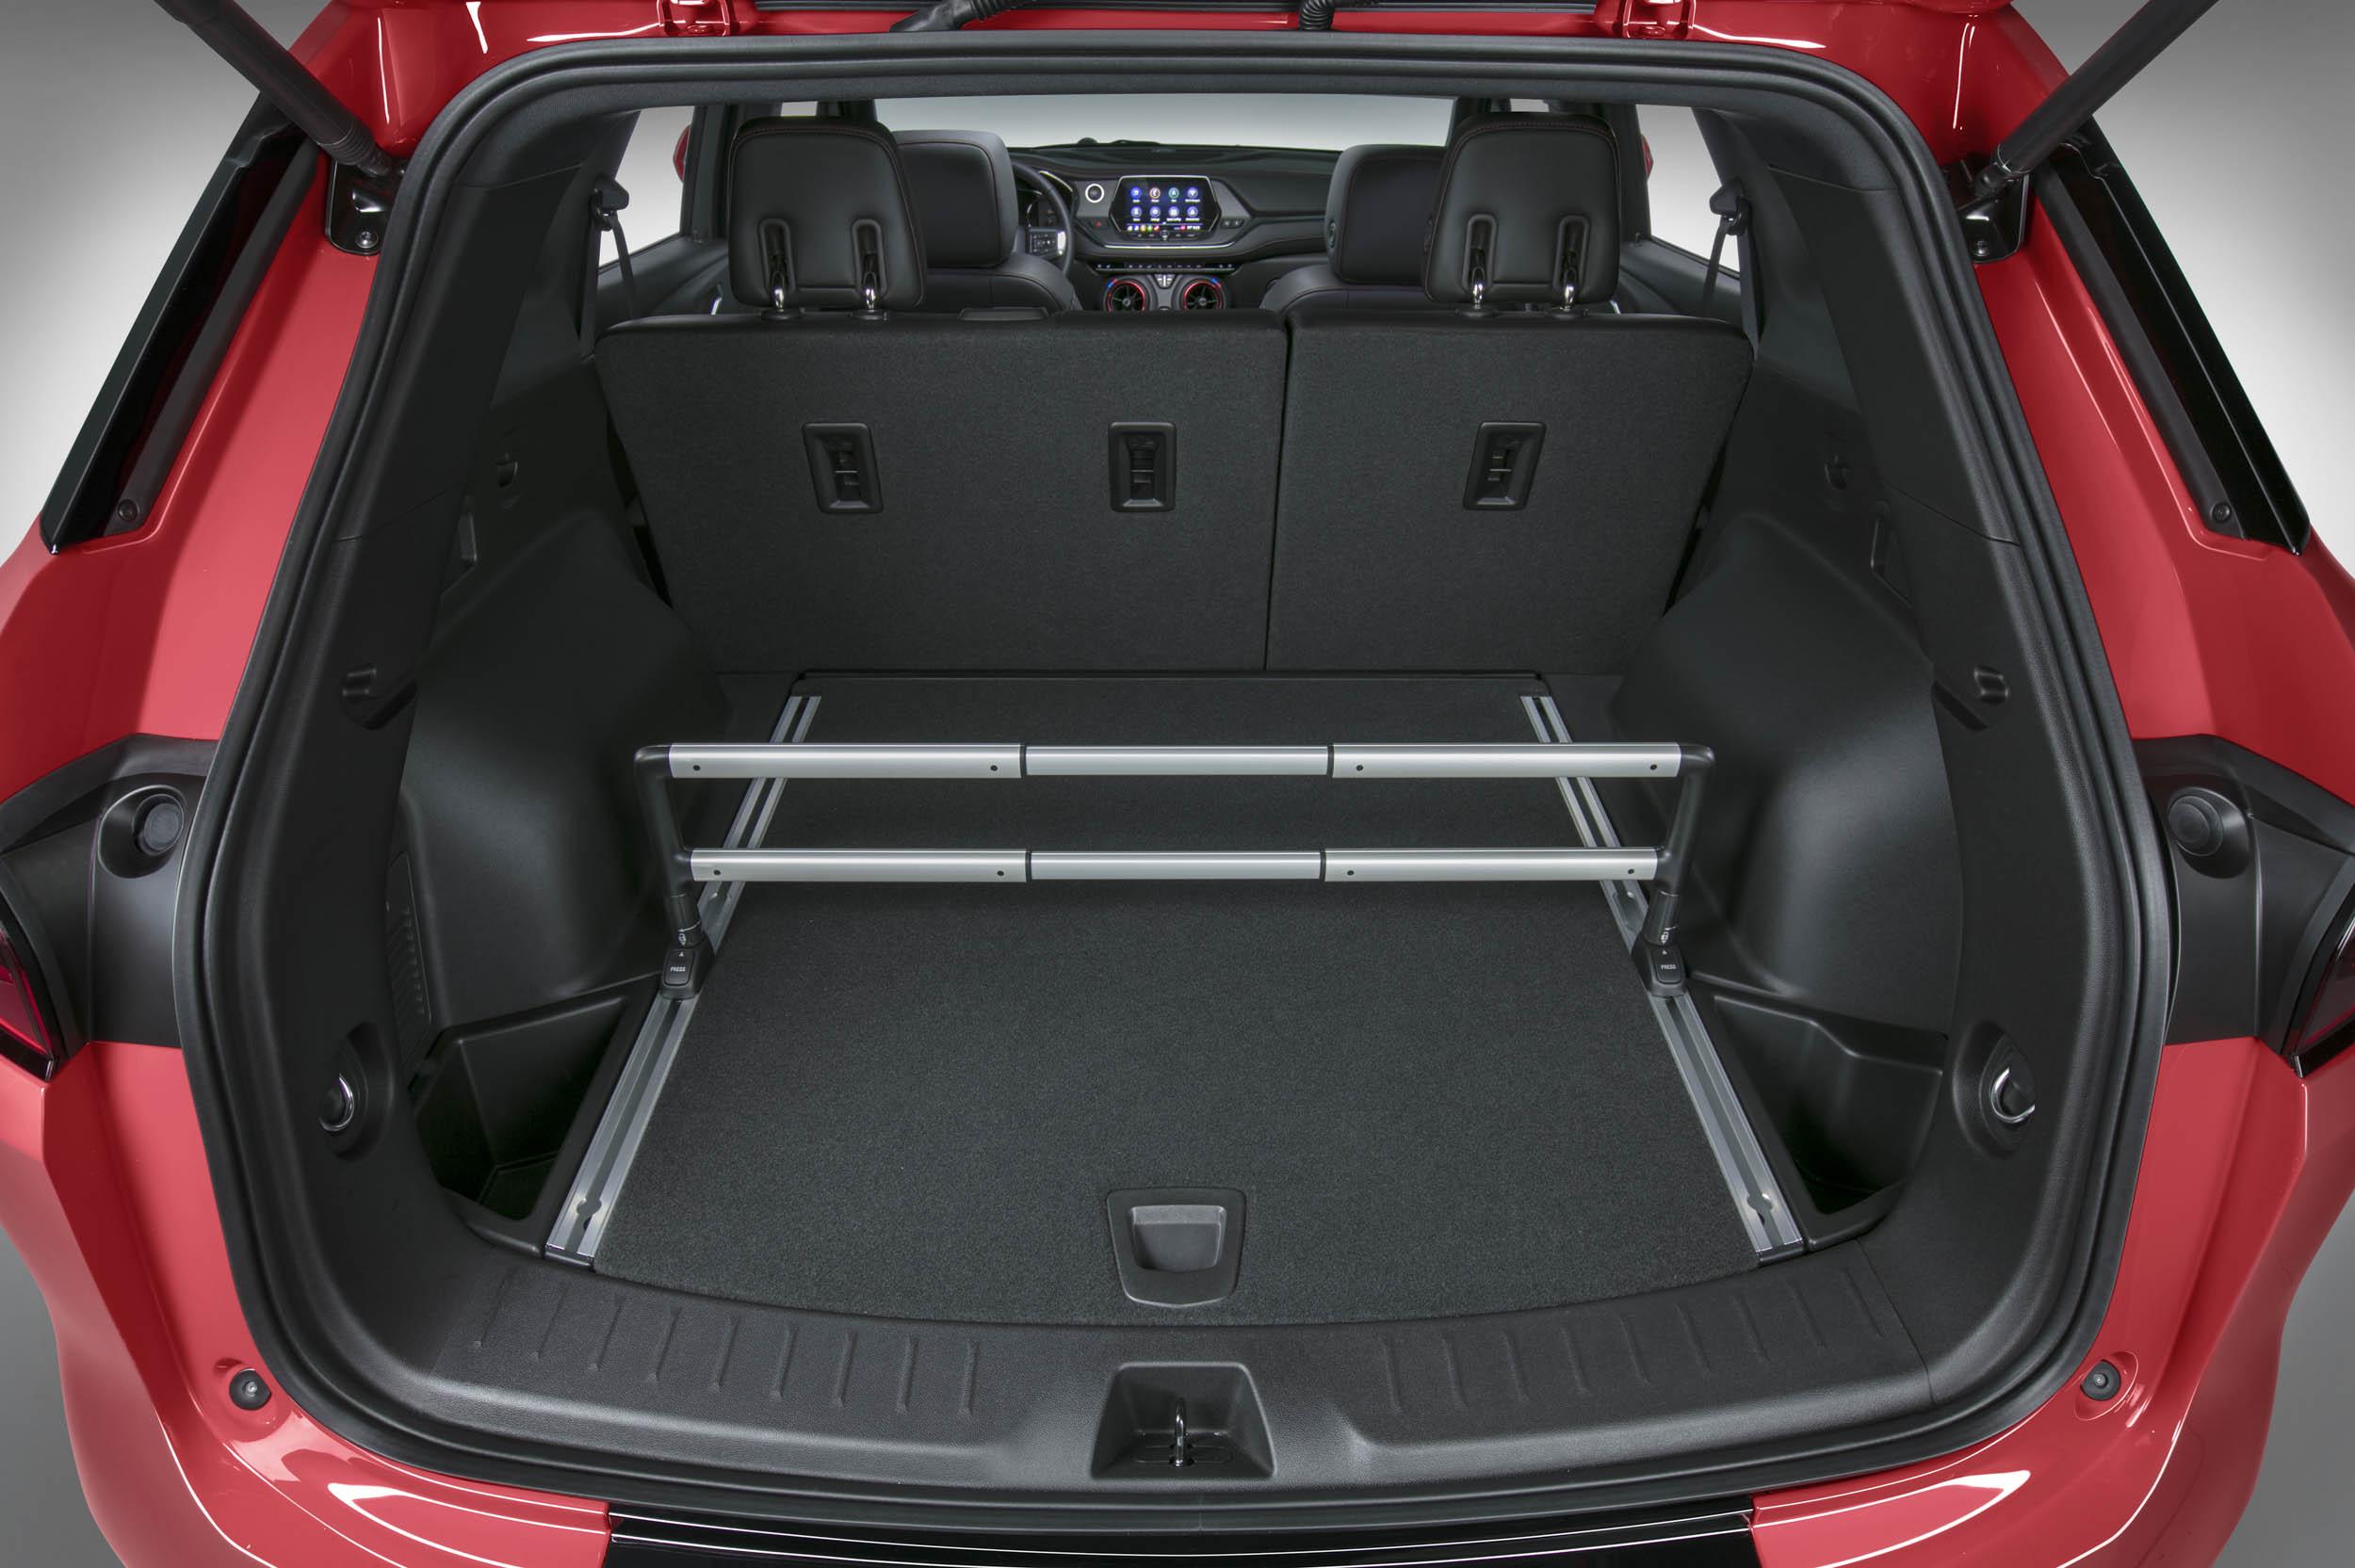 2019 Chevrolet Blazer trunk